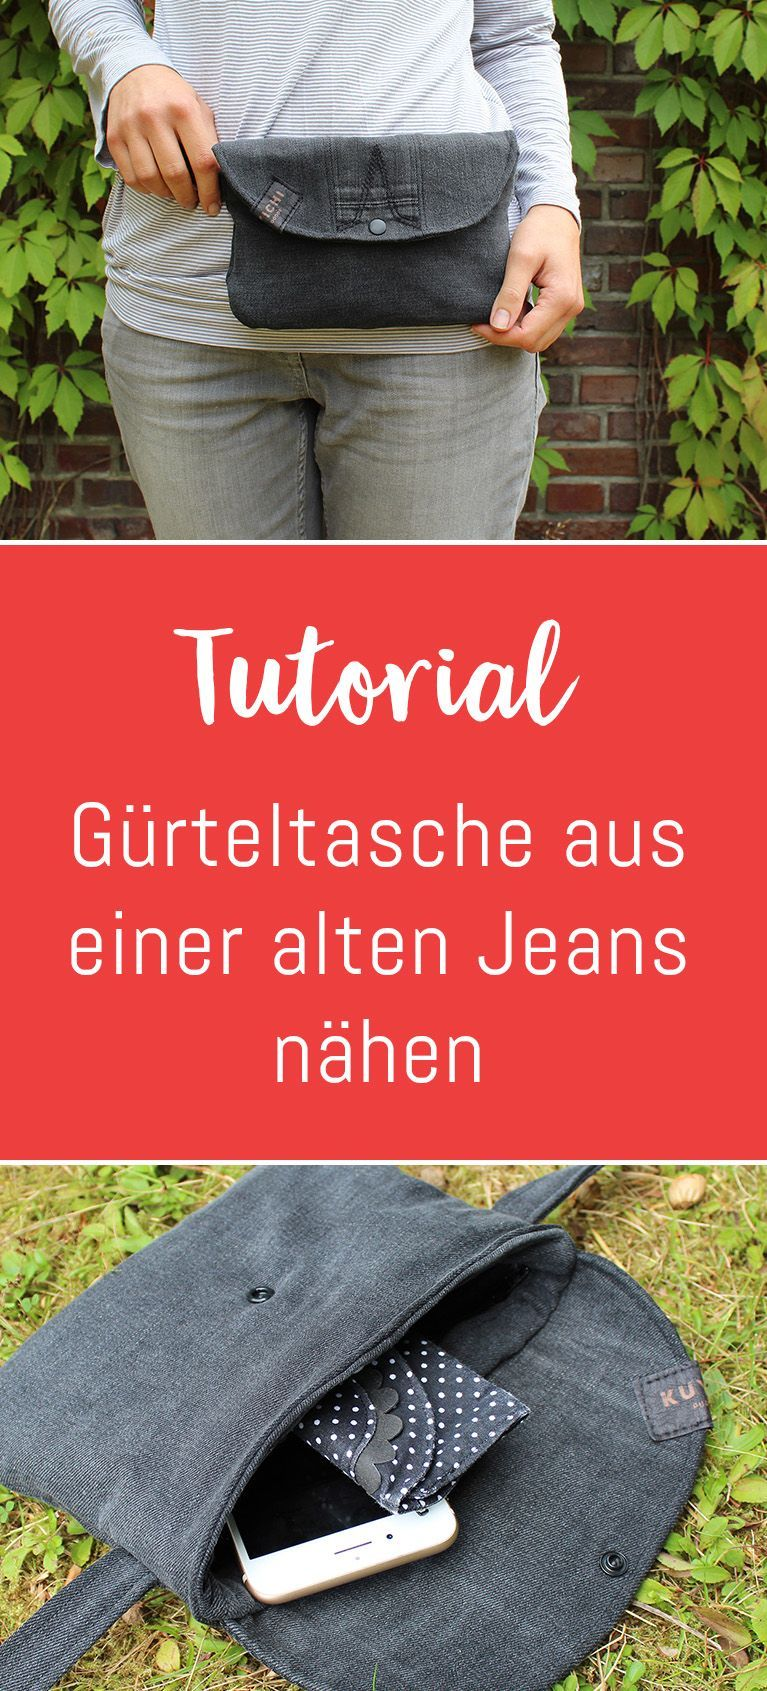 Upcycling-Projekt: Gürteltasche aus einer alten Jeans nähen - Kreativlabor Berlin